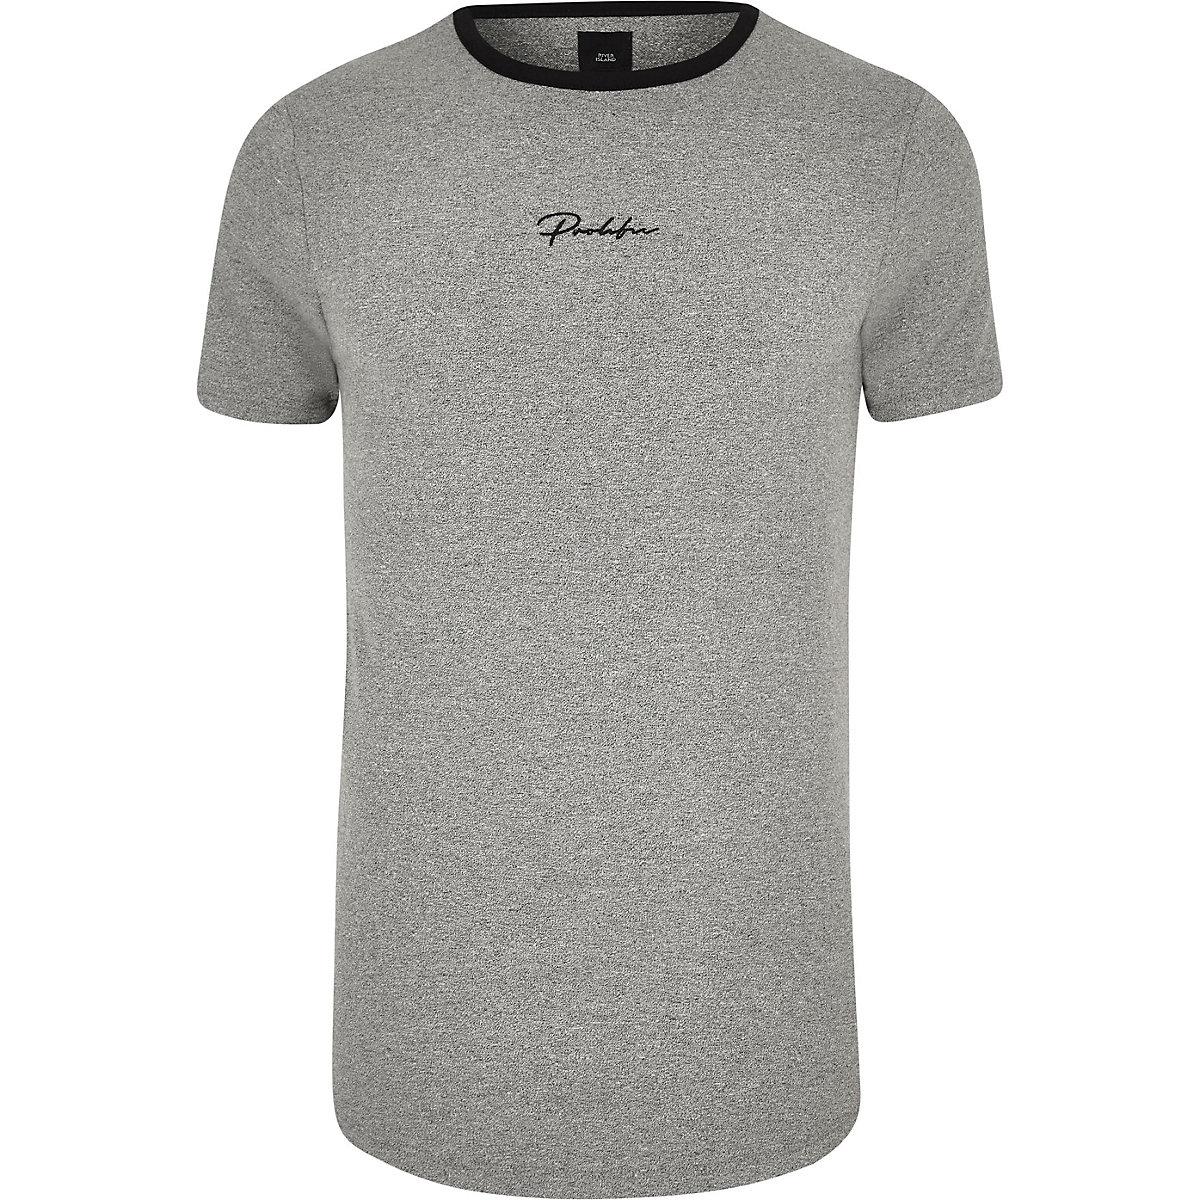 Big and Tall grey 'Prolific' curve T-shirt